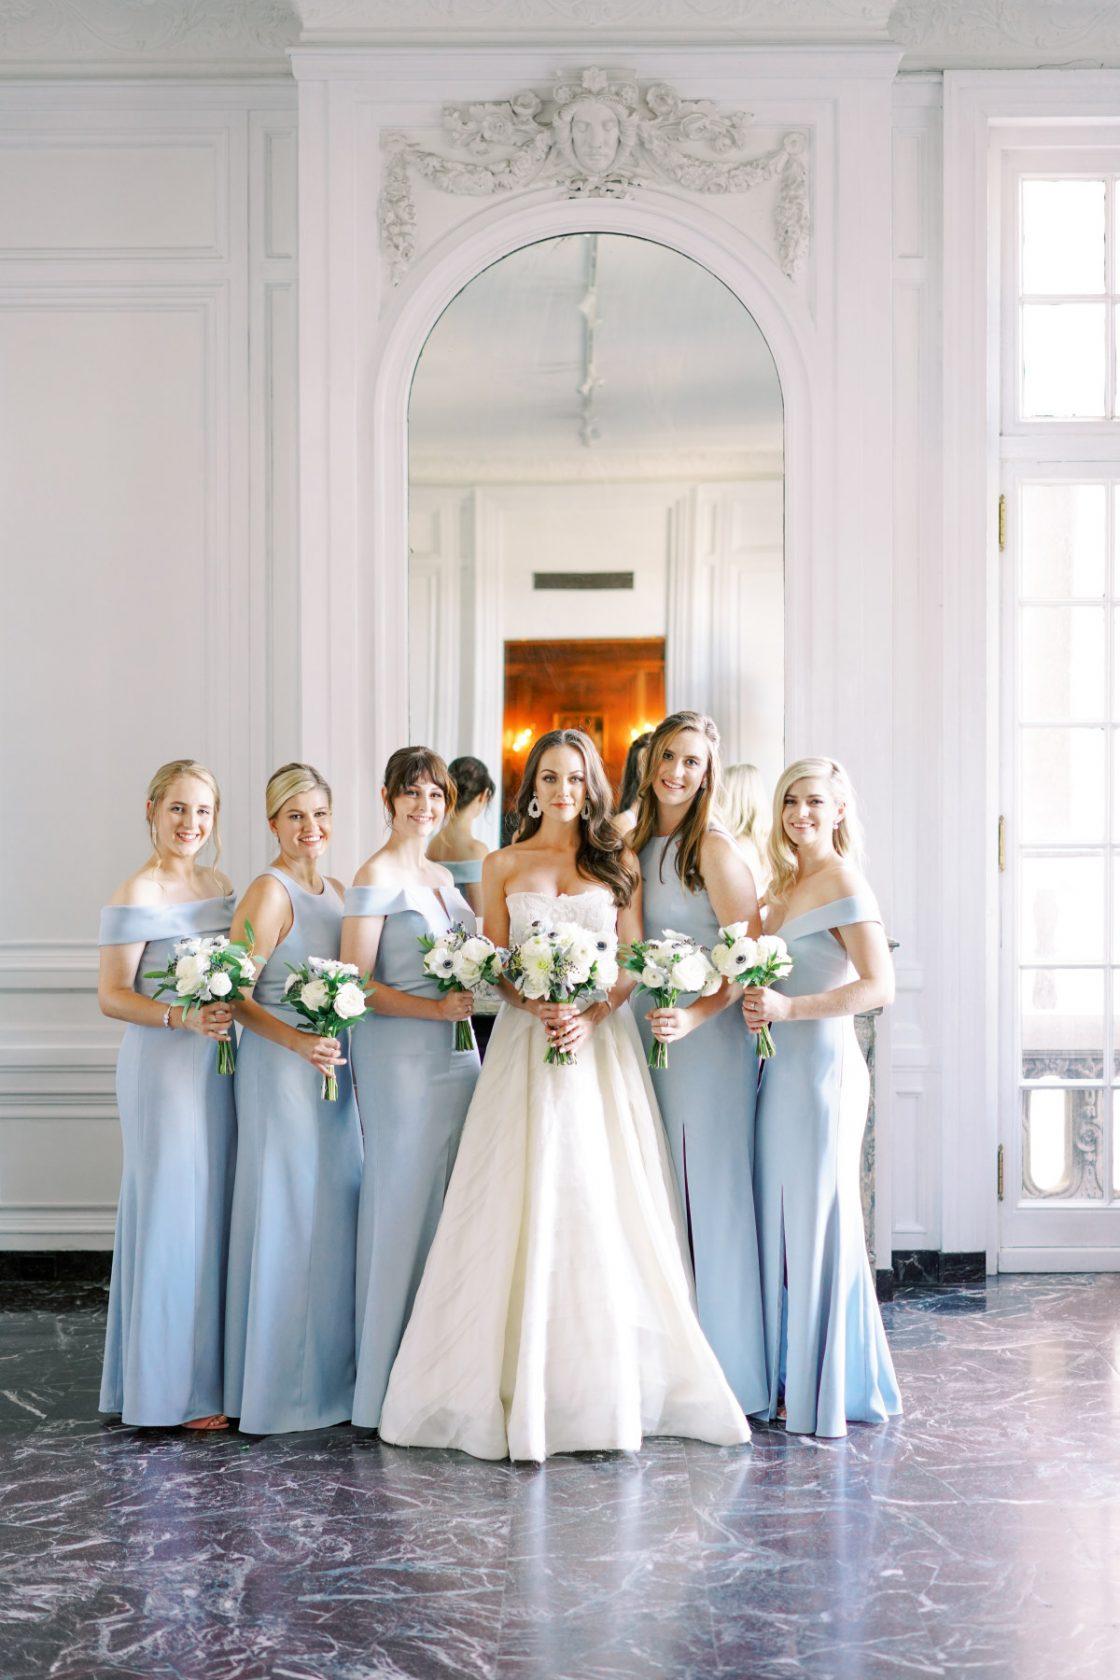 Elegant Powder Blue Bridesmaids Dresses